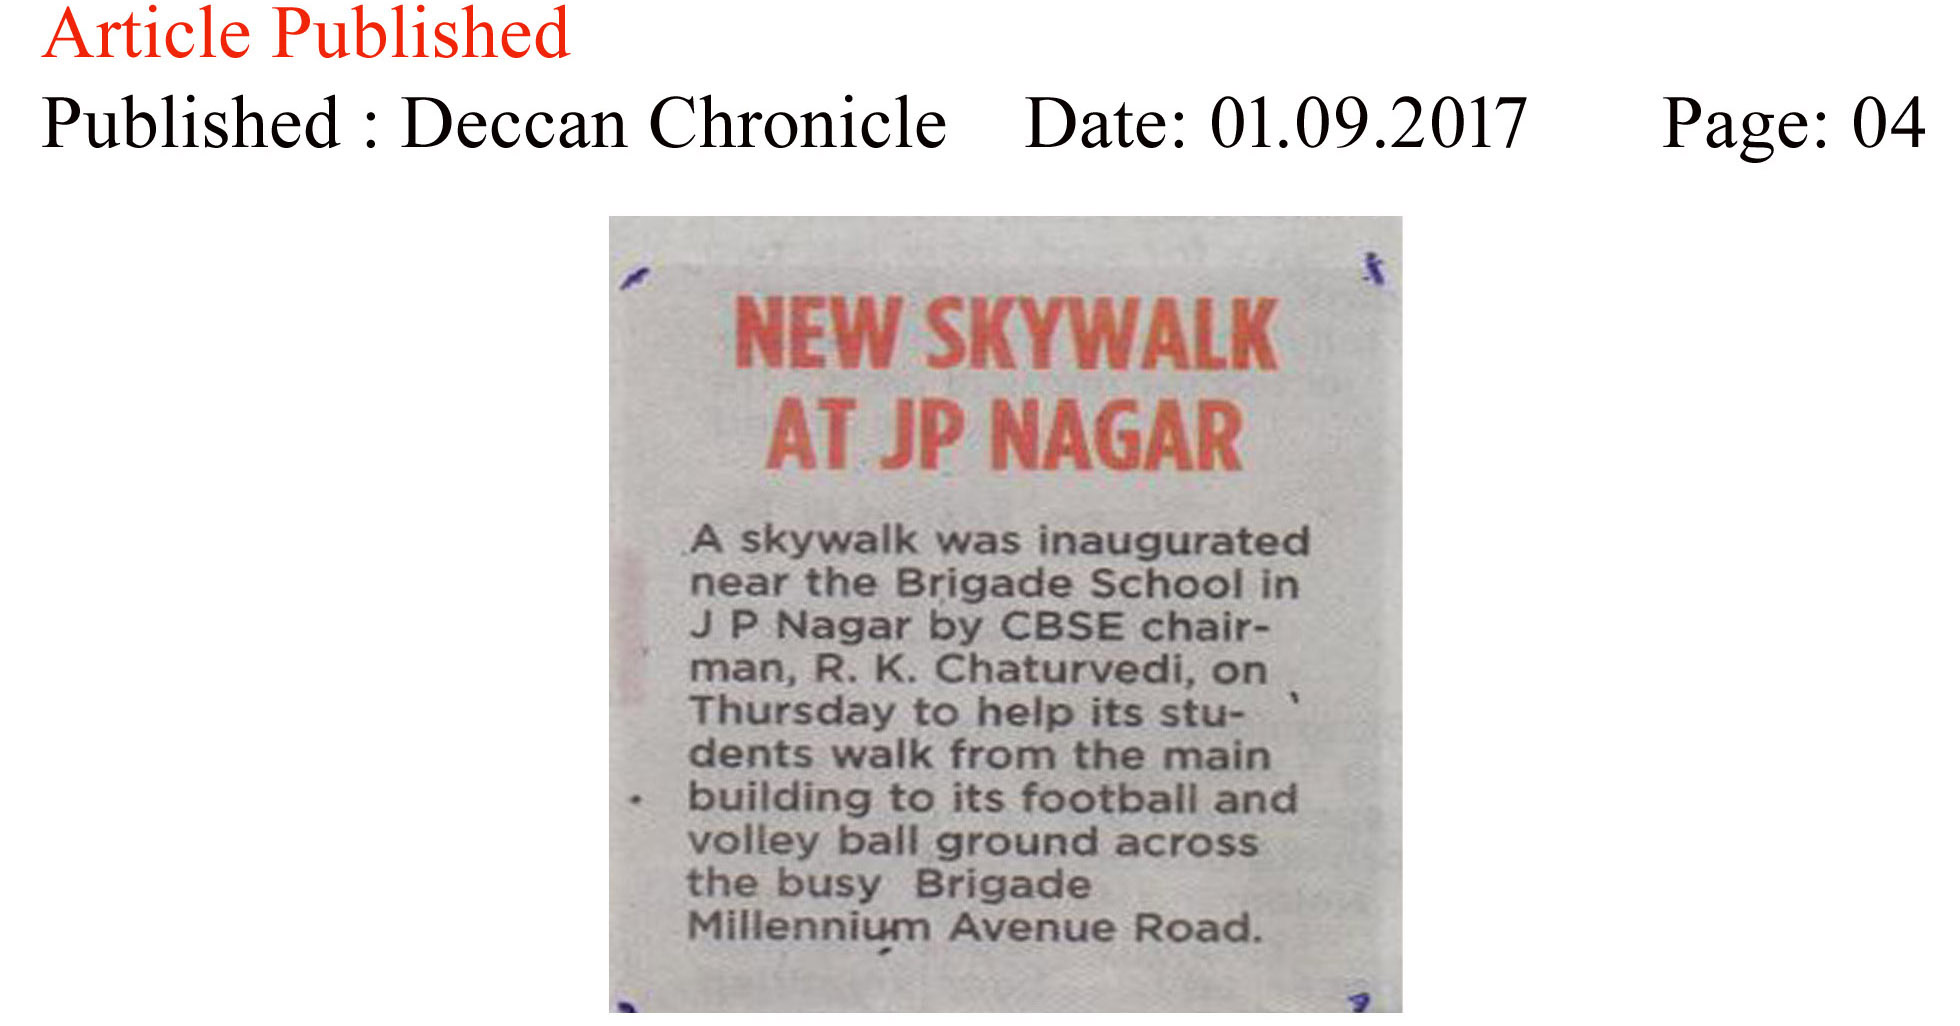 New Skywalk at JP Nagar—Deccan Chronicle